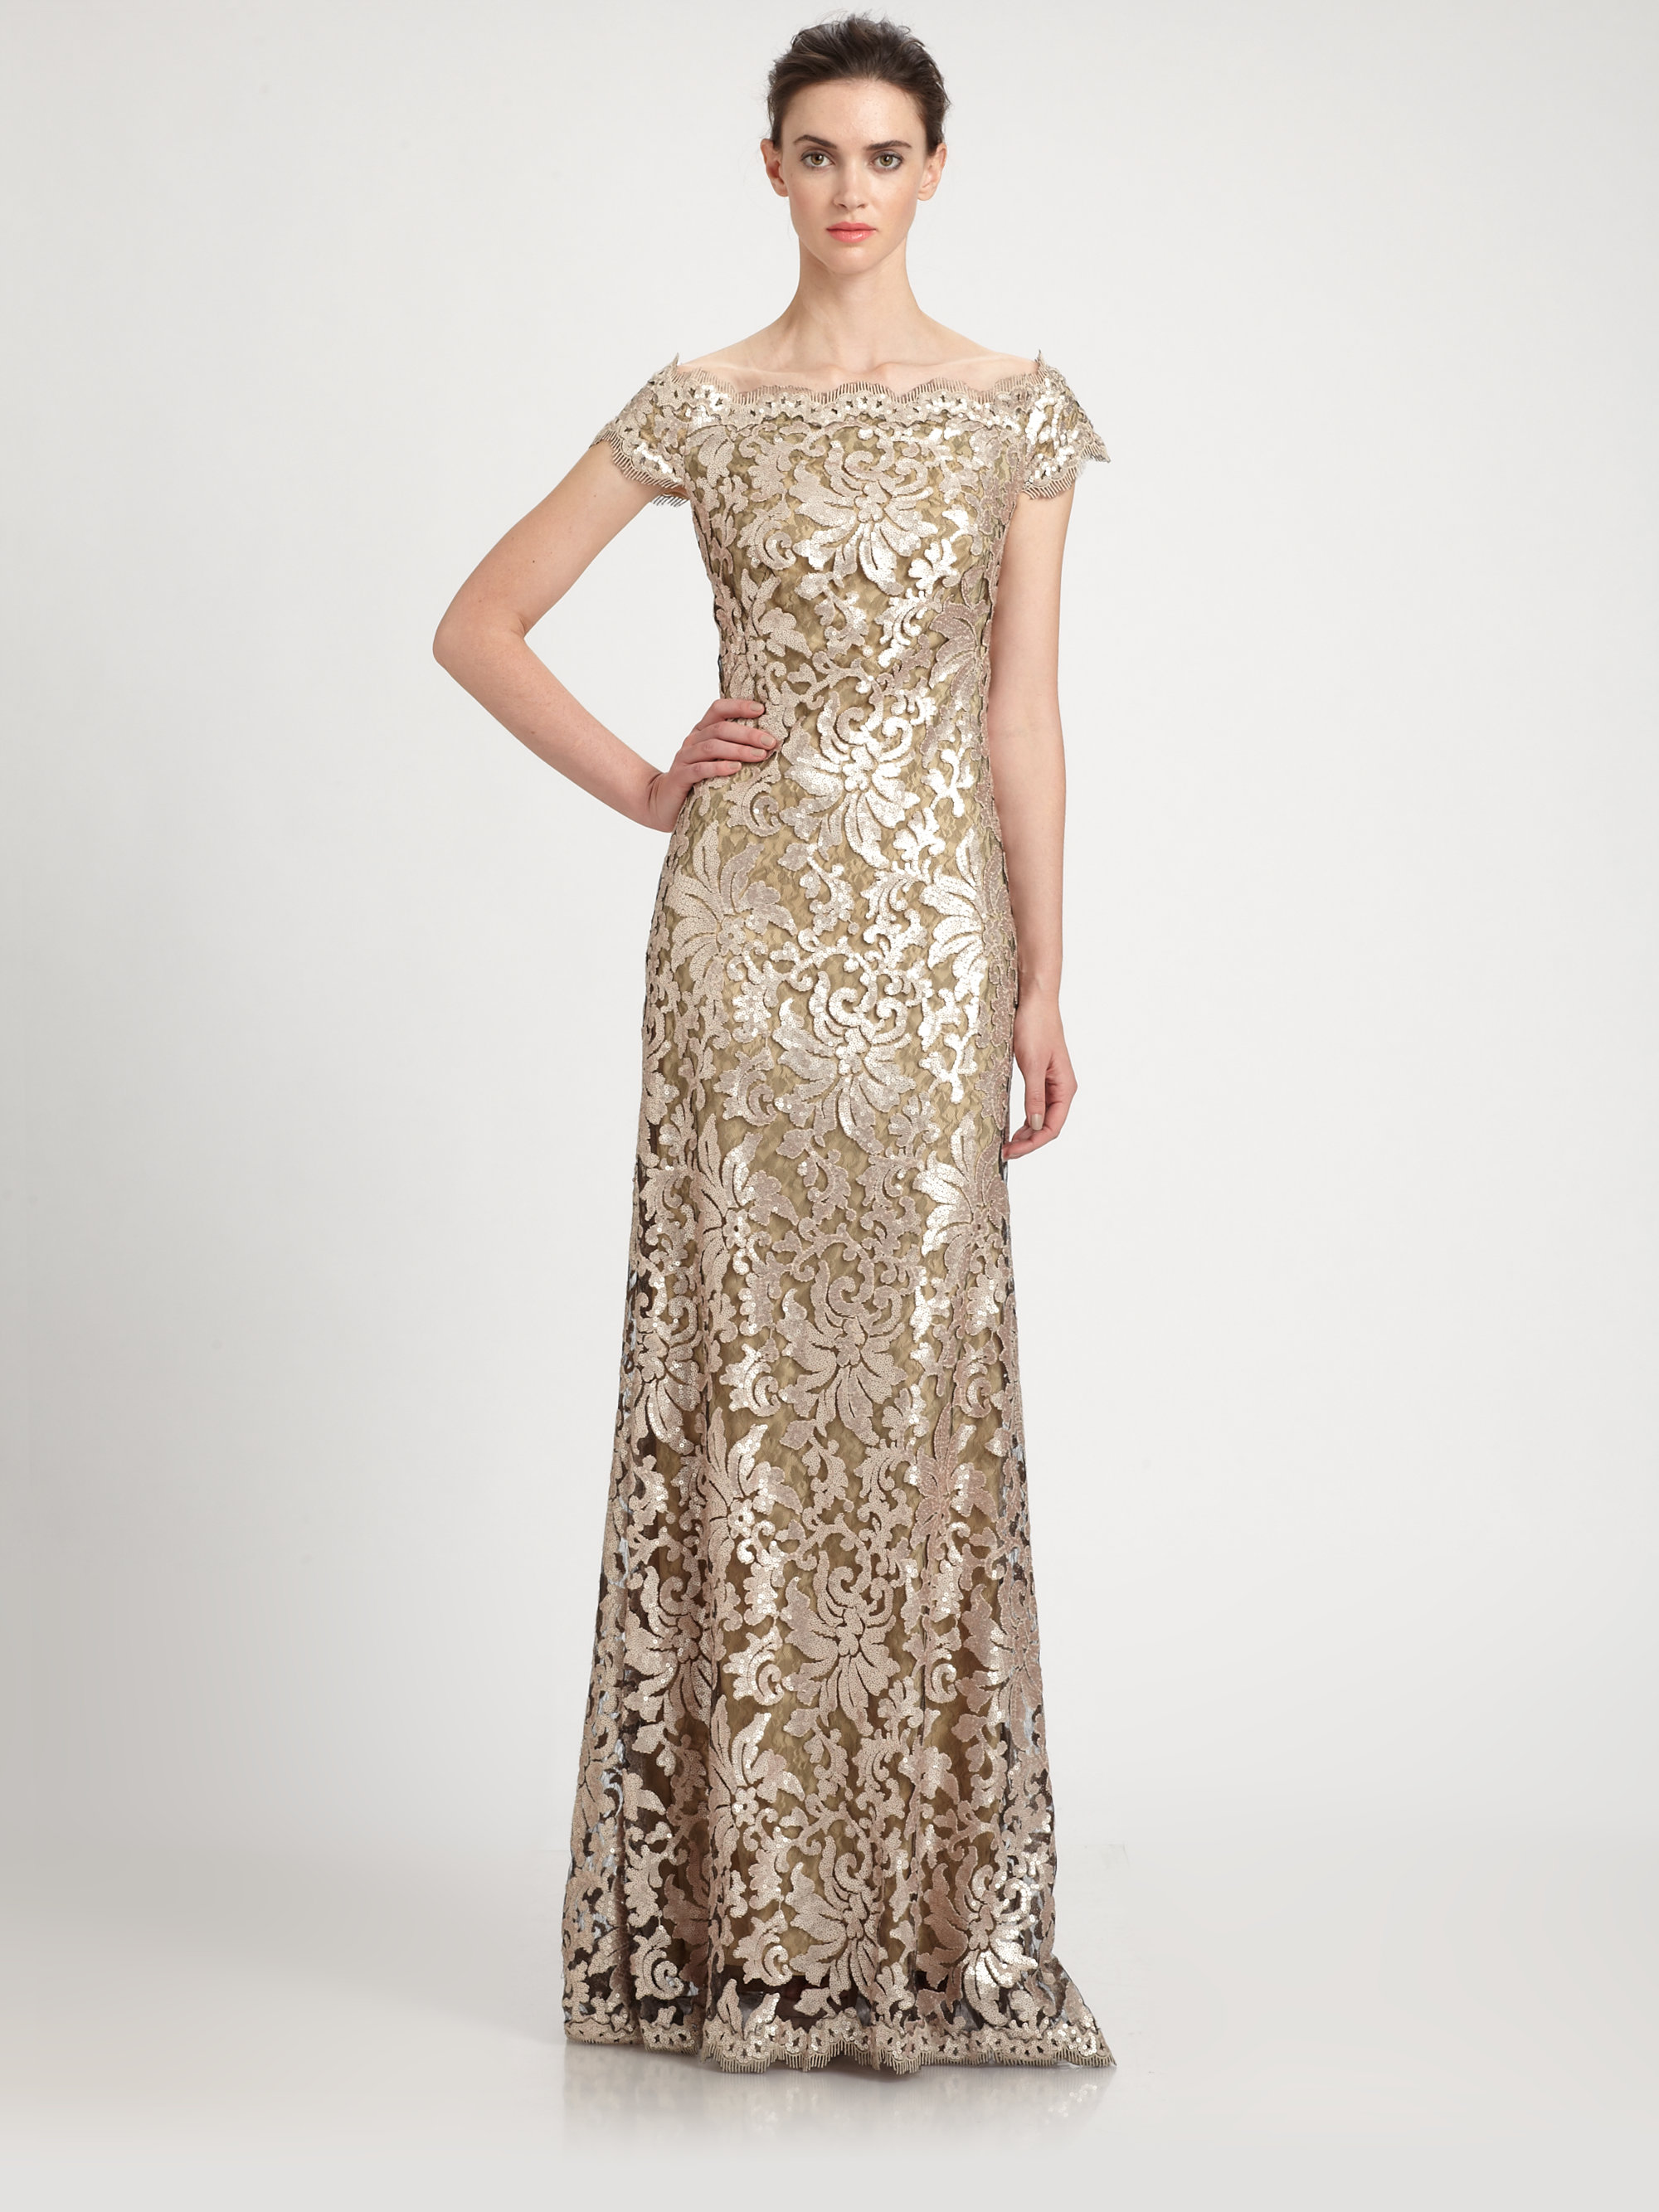 b979a7f668dd Tadashi Shoji Offtheshoulder Sequined Lace Gown in Metallic - Lyst